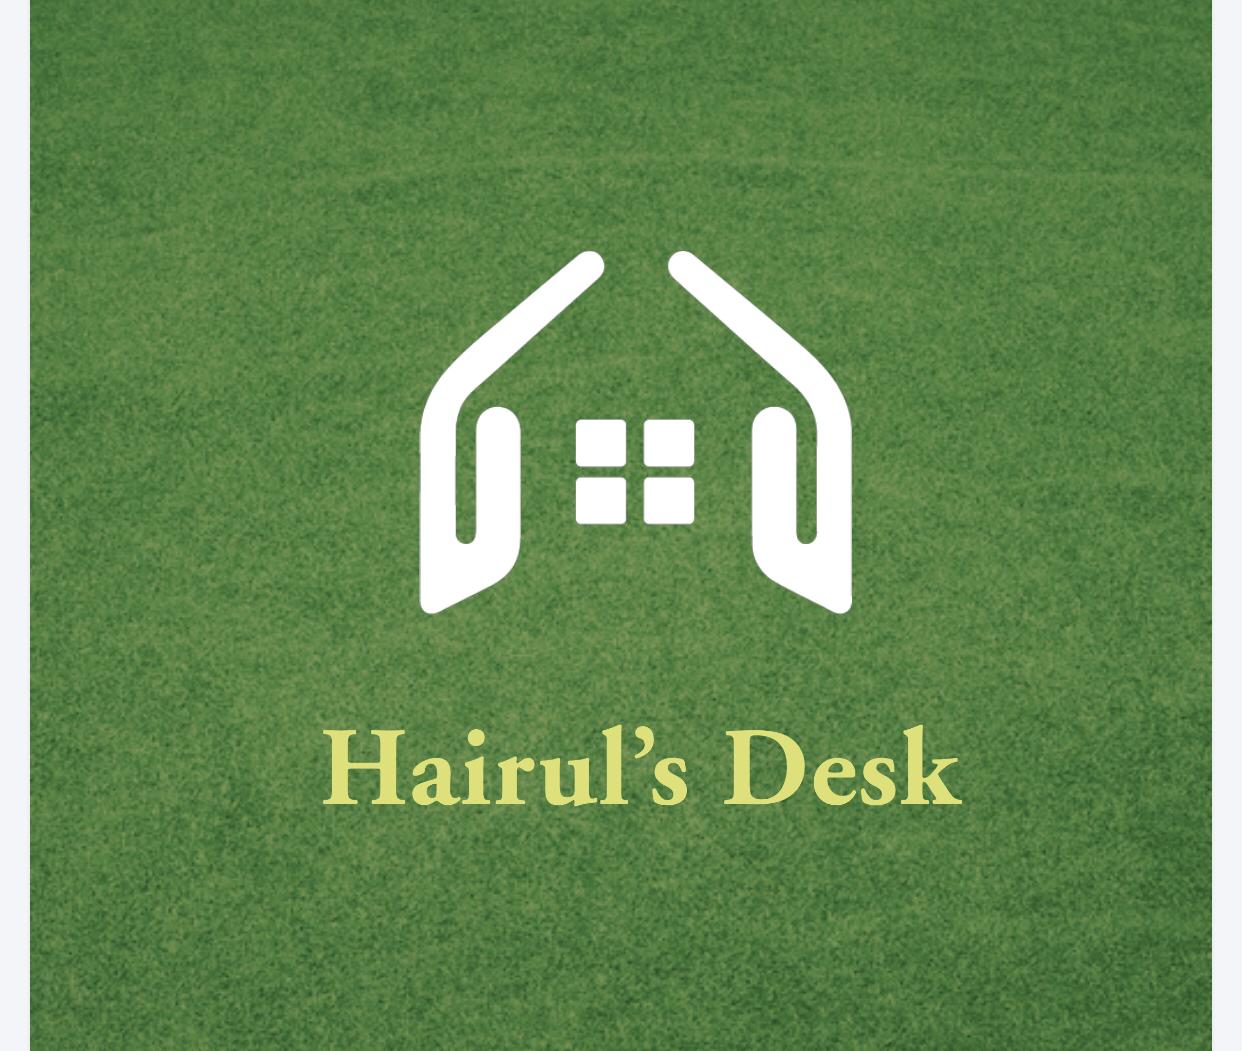 Hairul's Desk image